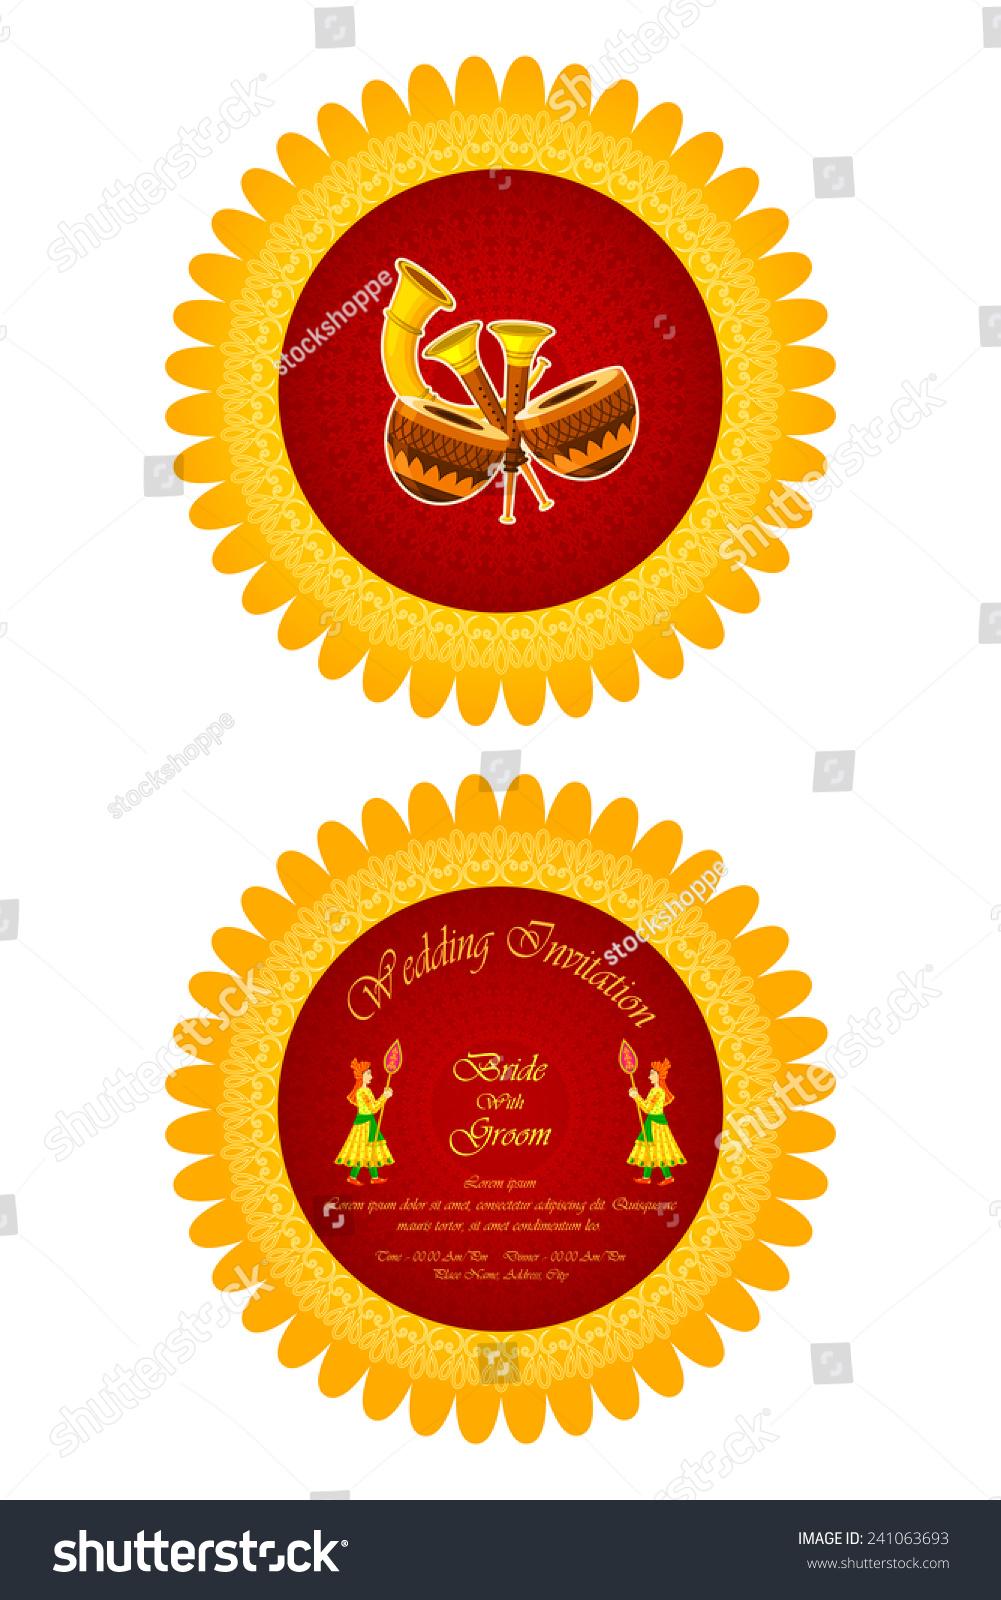 The best wedding invitation blog: Indian wedding invitations vector